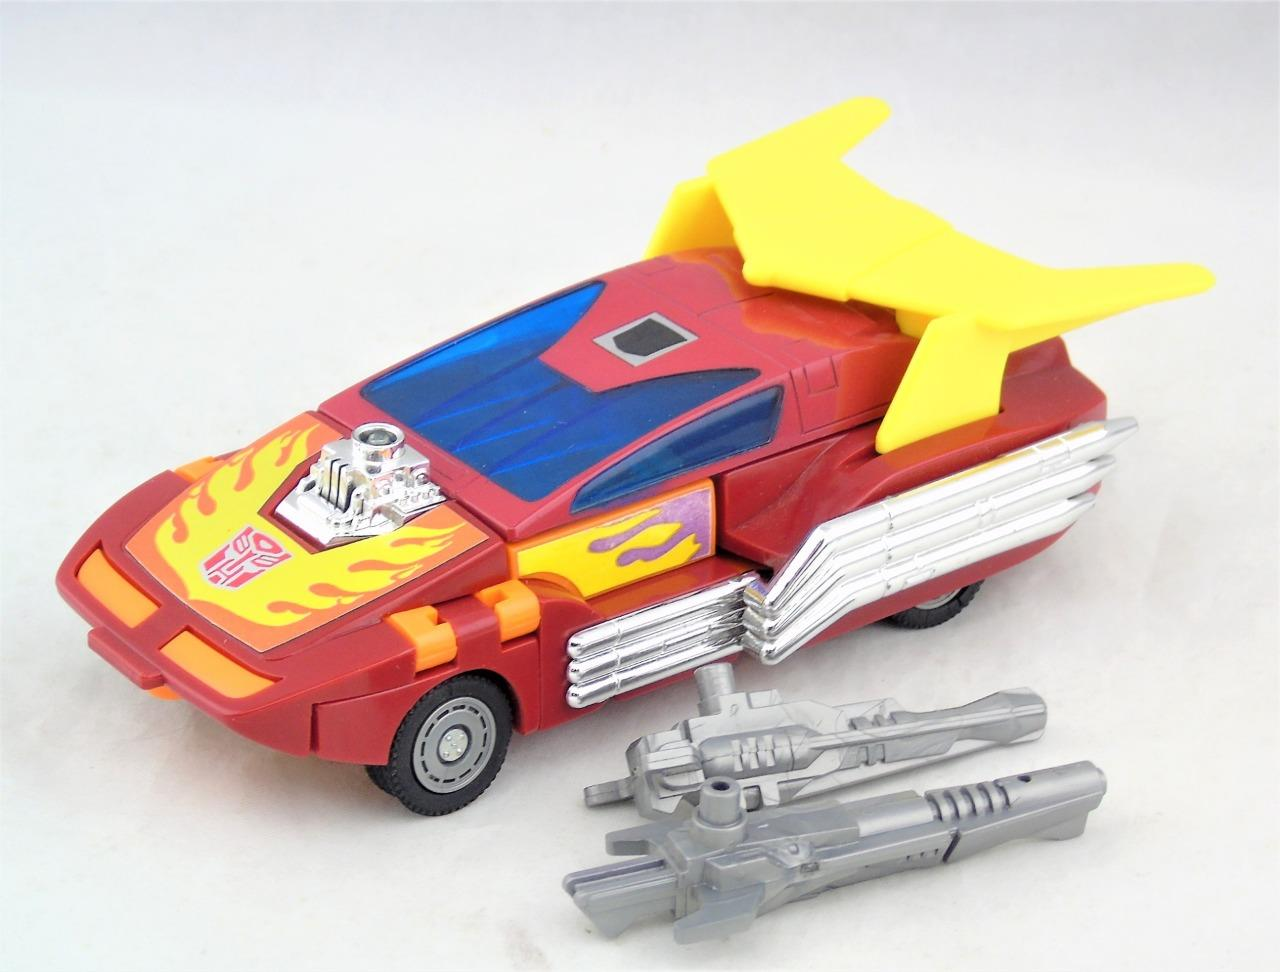 Transformers Original G1 1986 Autobot auto caliente Rod completare